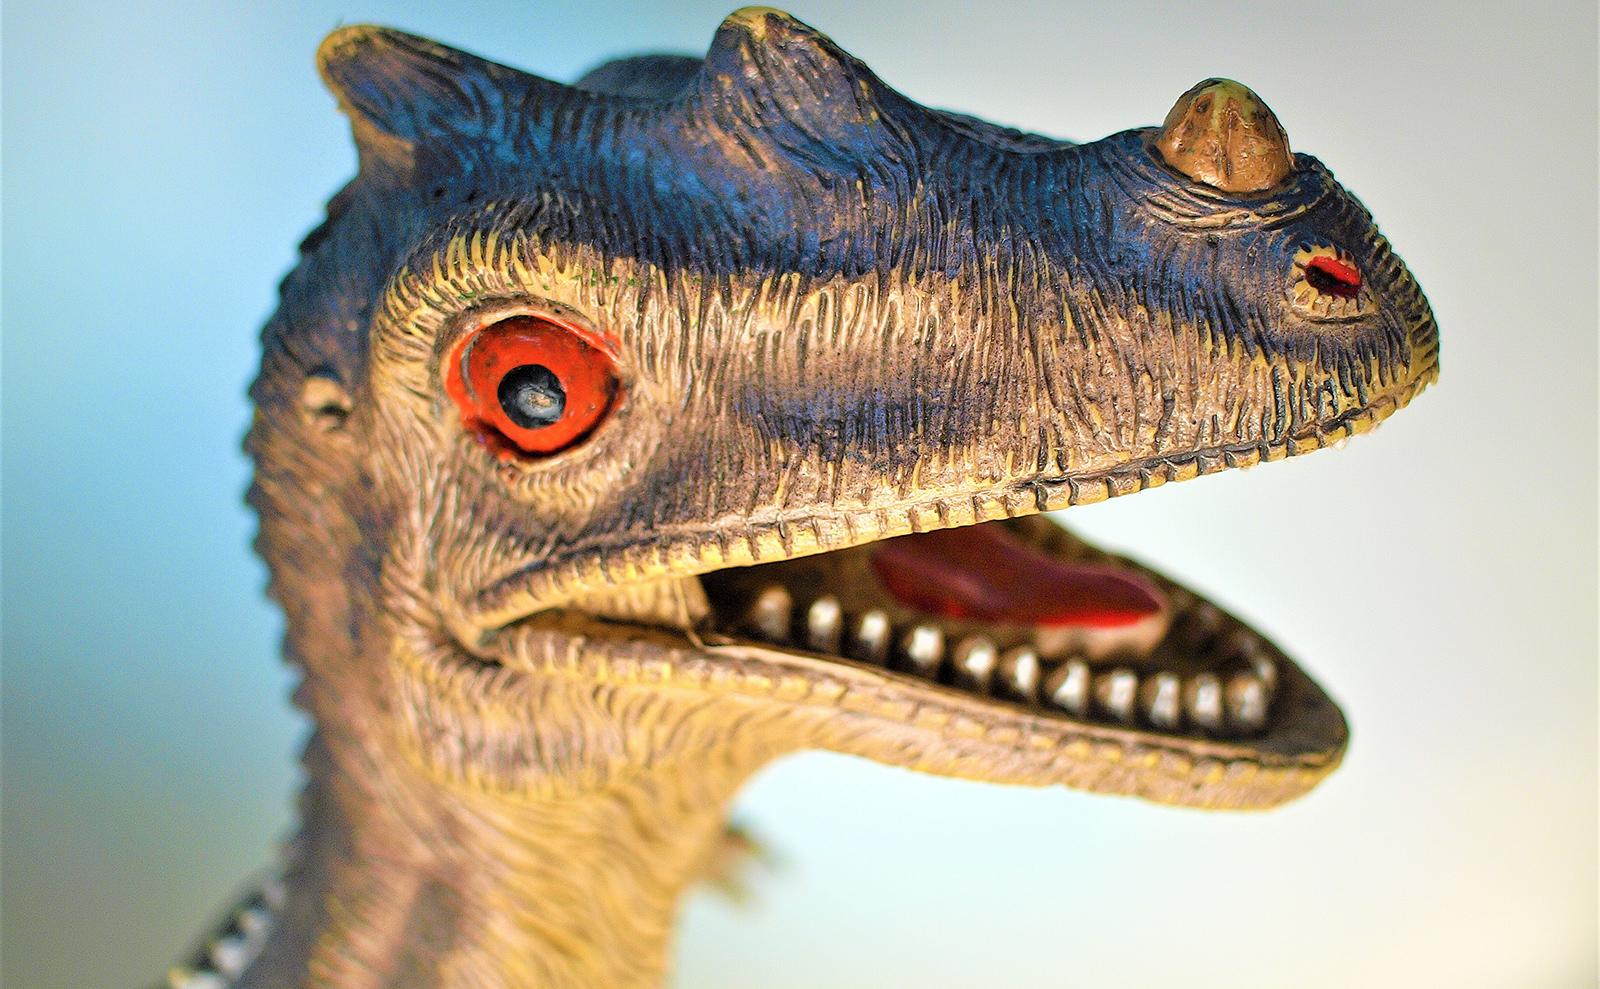 close up of toy dinosaur